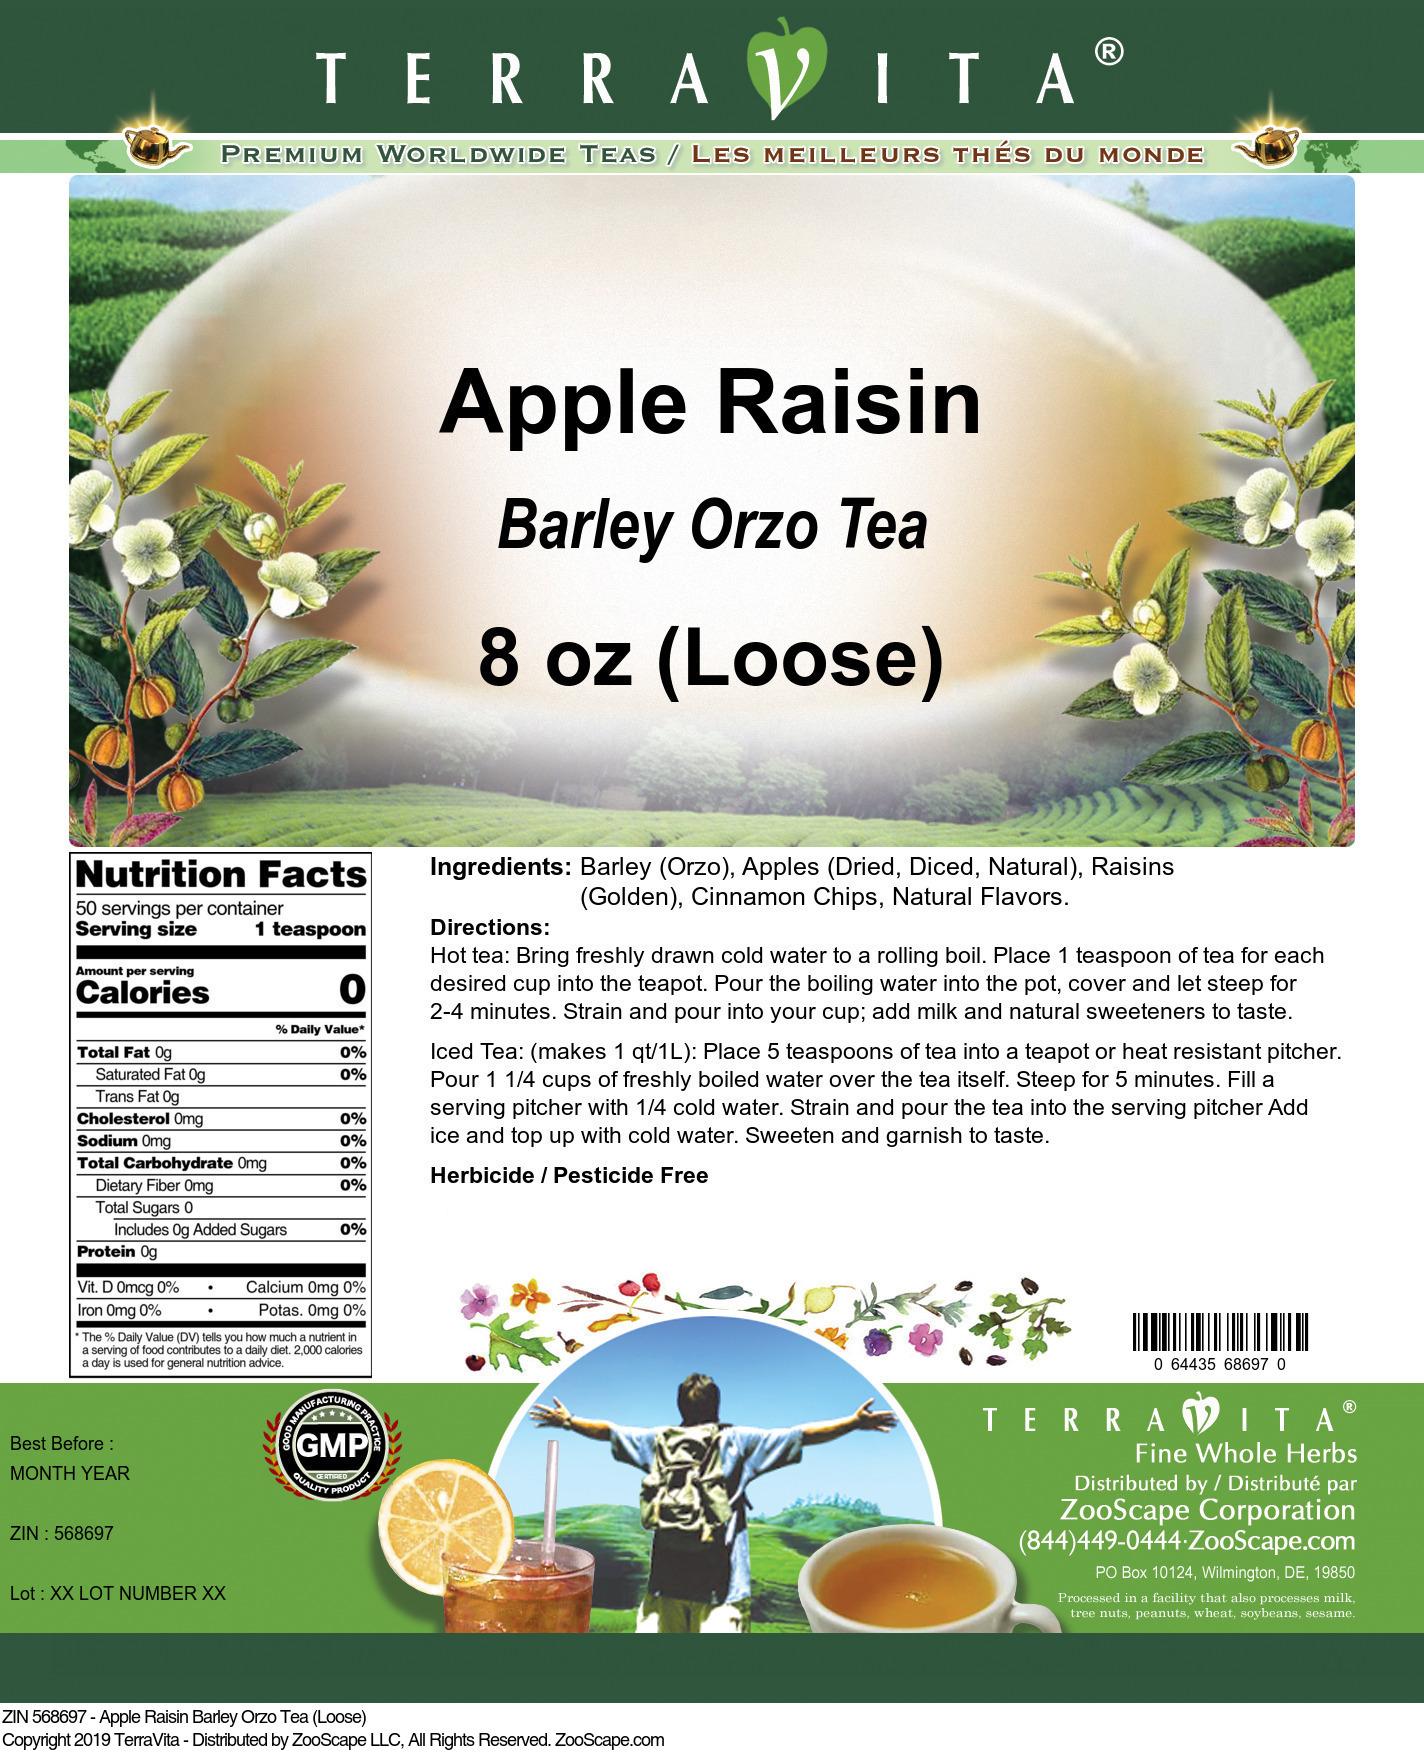 Apple Raisin Barley Orzo Tea (Loose)